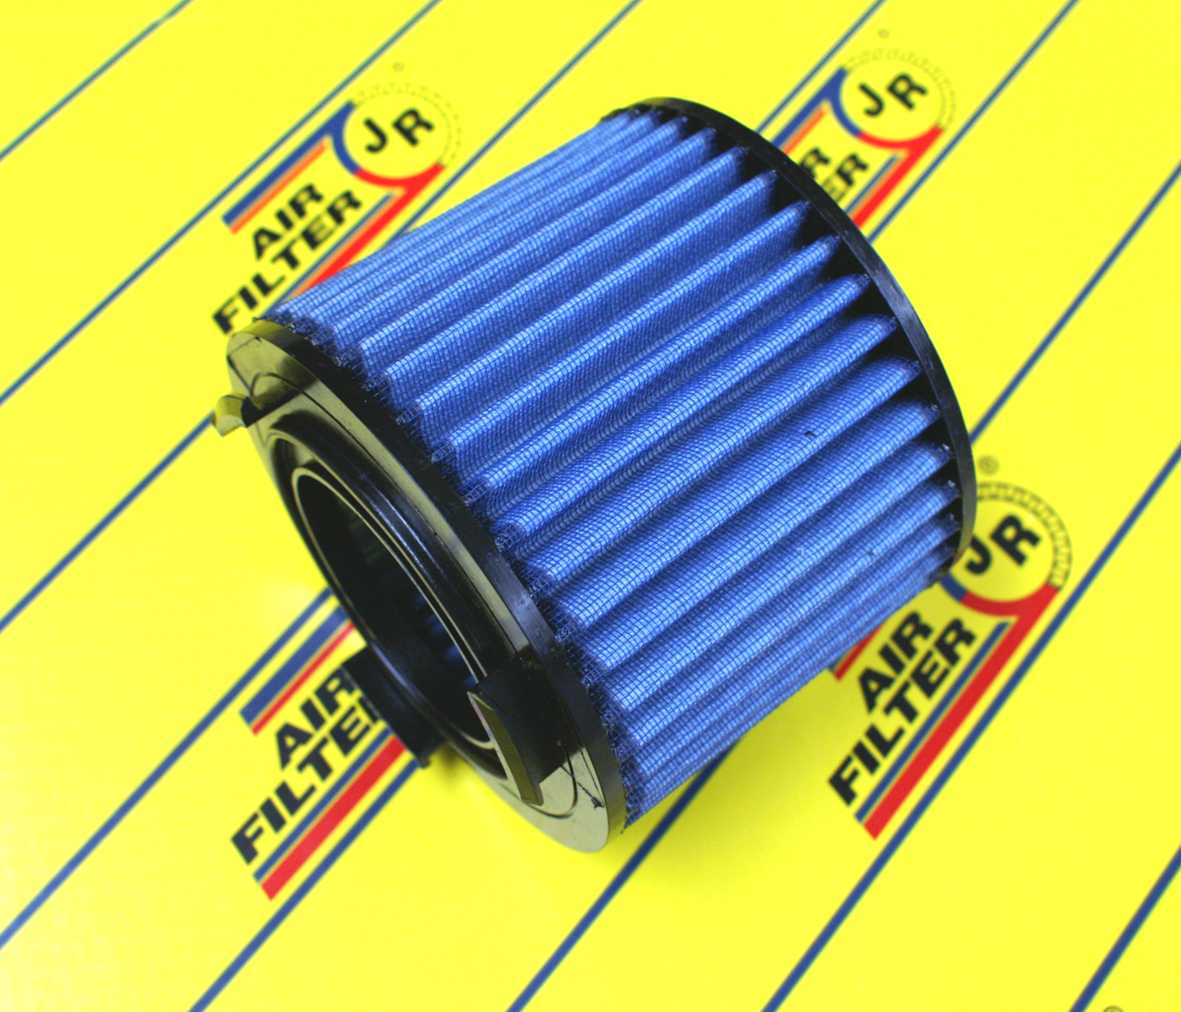 Sportovní vzduchový filtr T 73110 SKODA Fabia II 3/10-> 1,2L TDI